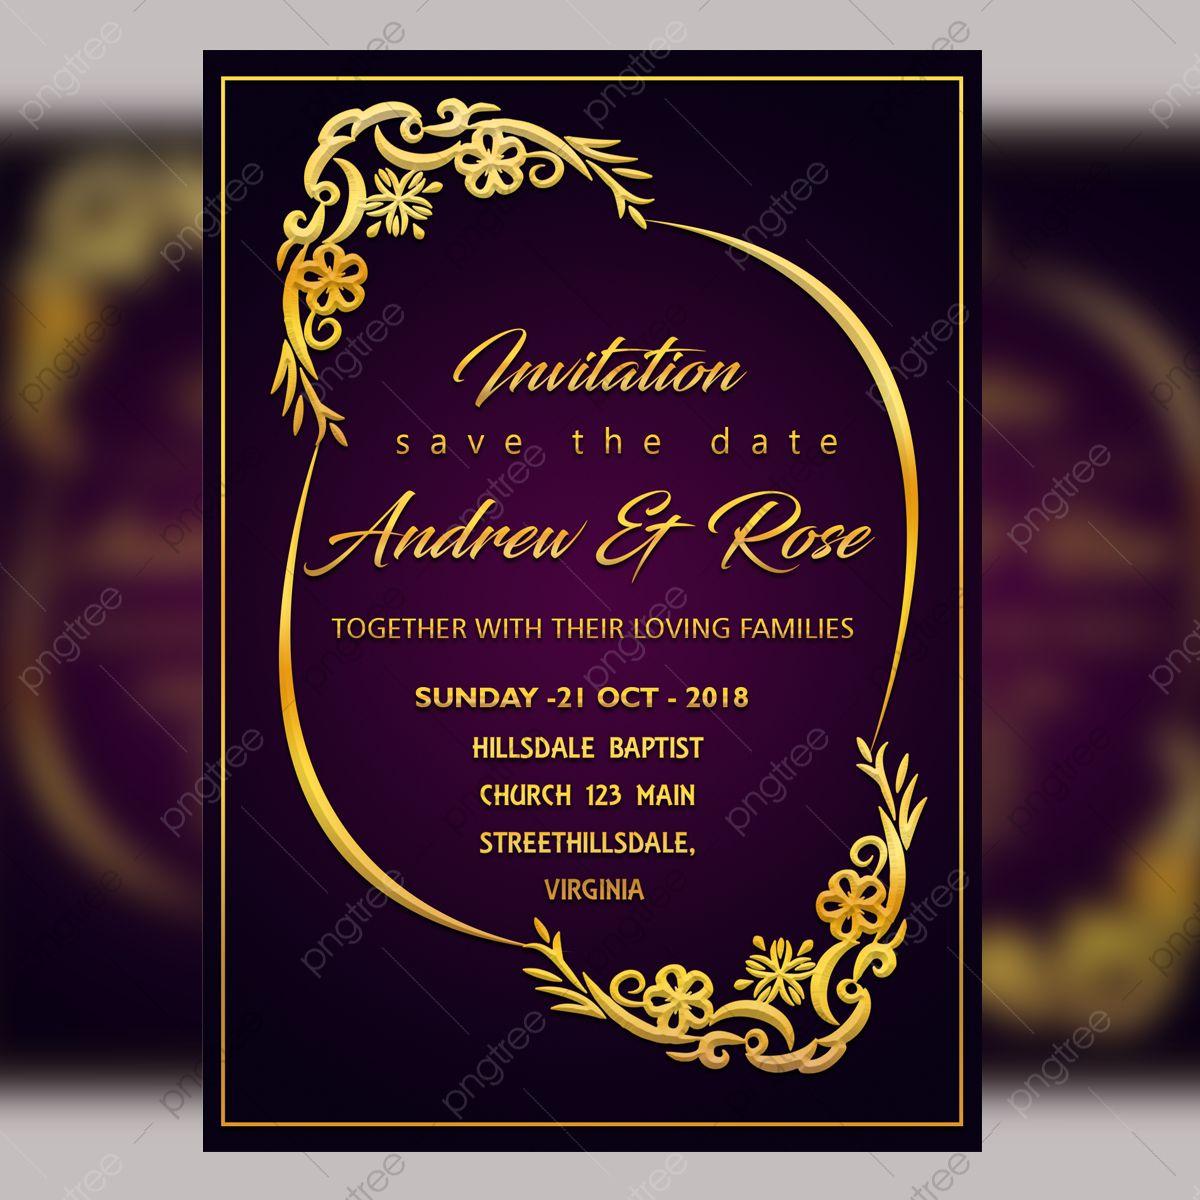 006 Imposing Sample Wedding Invitation Card Template Idea  Templates Free Design Response WordingFull